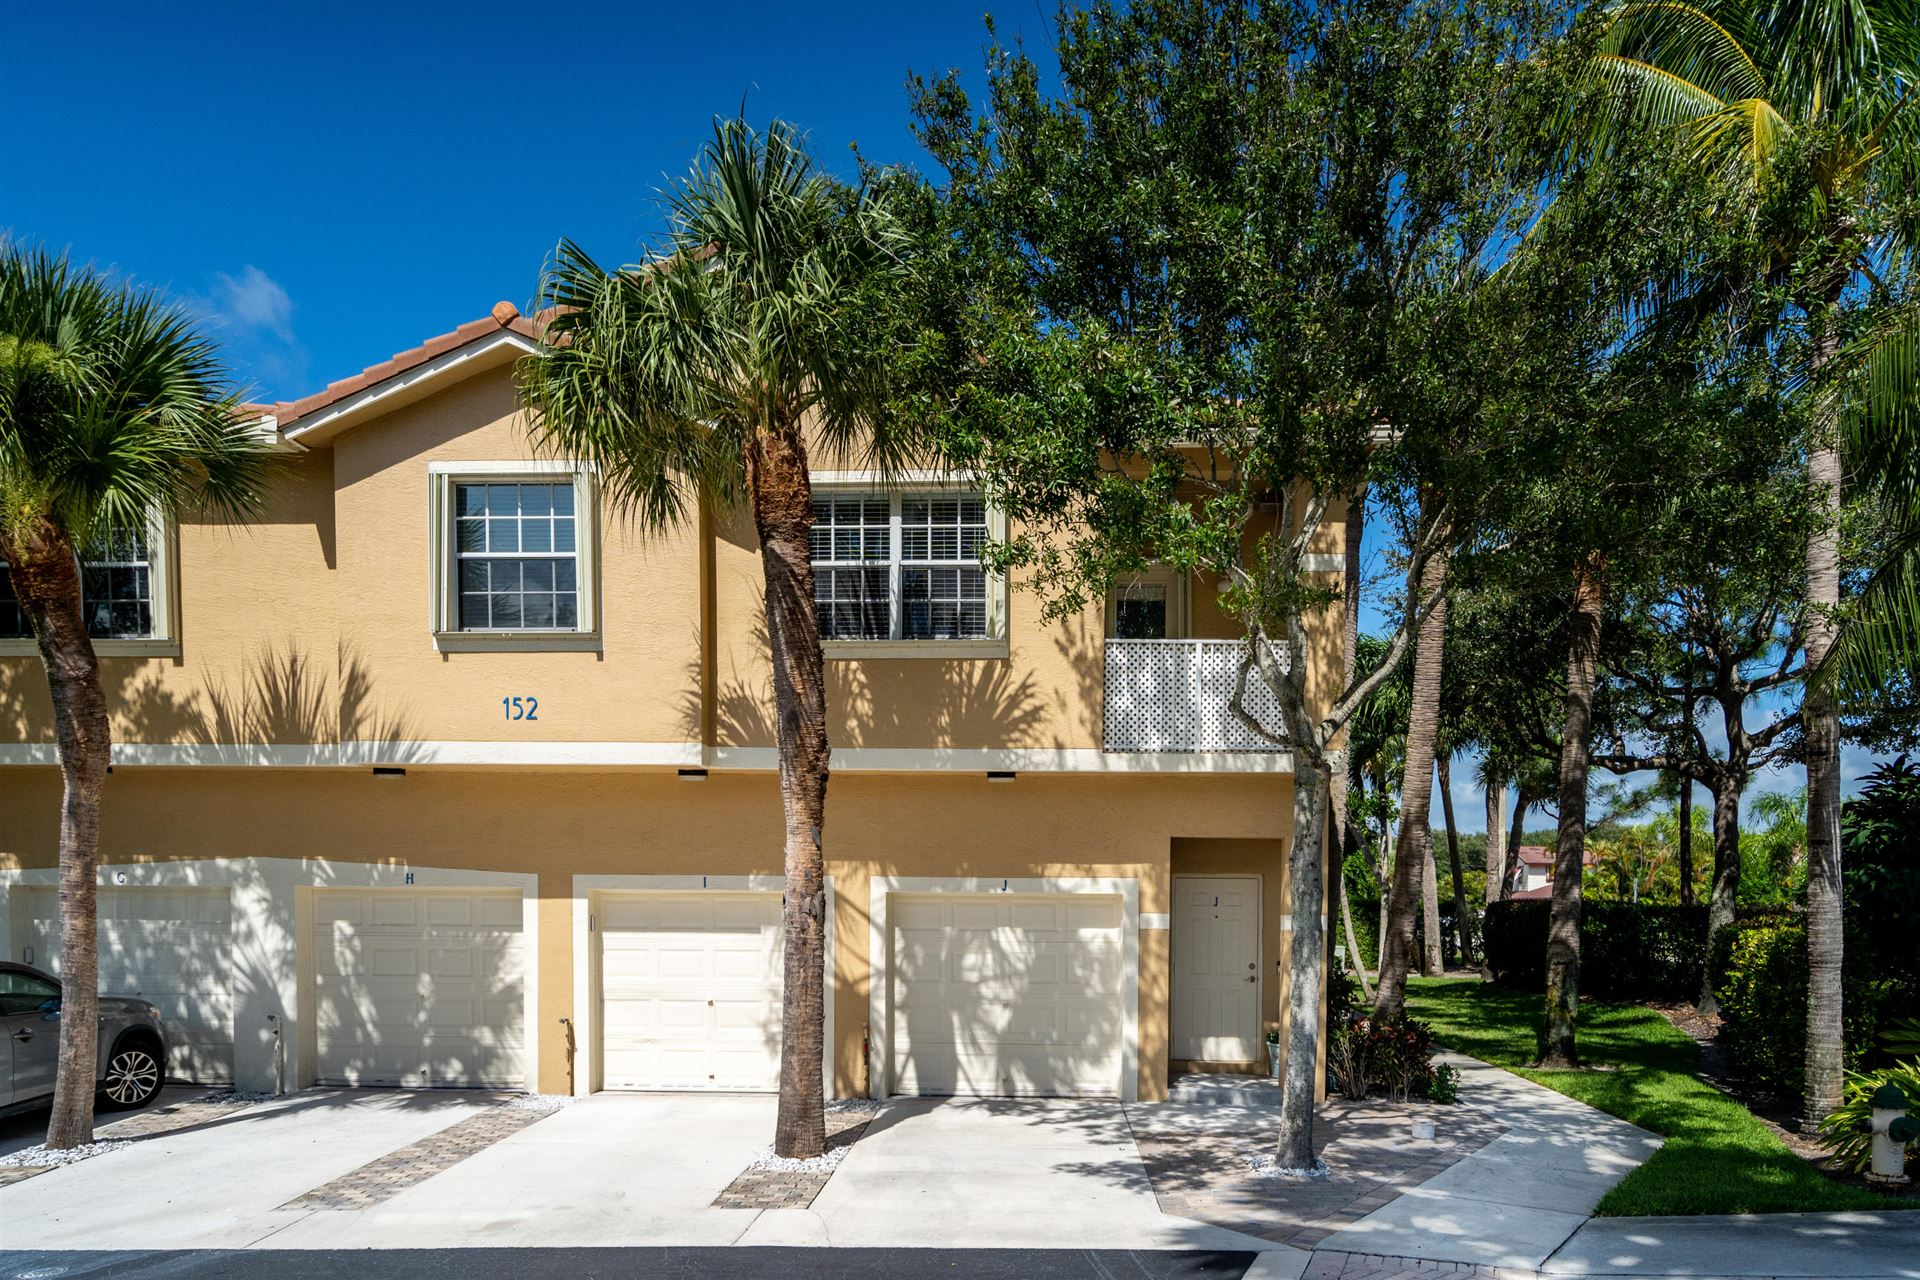 Photo for 152 Village Boulevard #J, Tequesta, FL 33469 (MLS # RX-10739429)